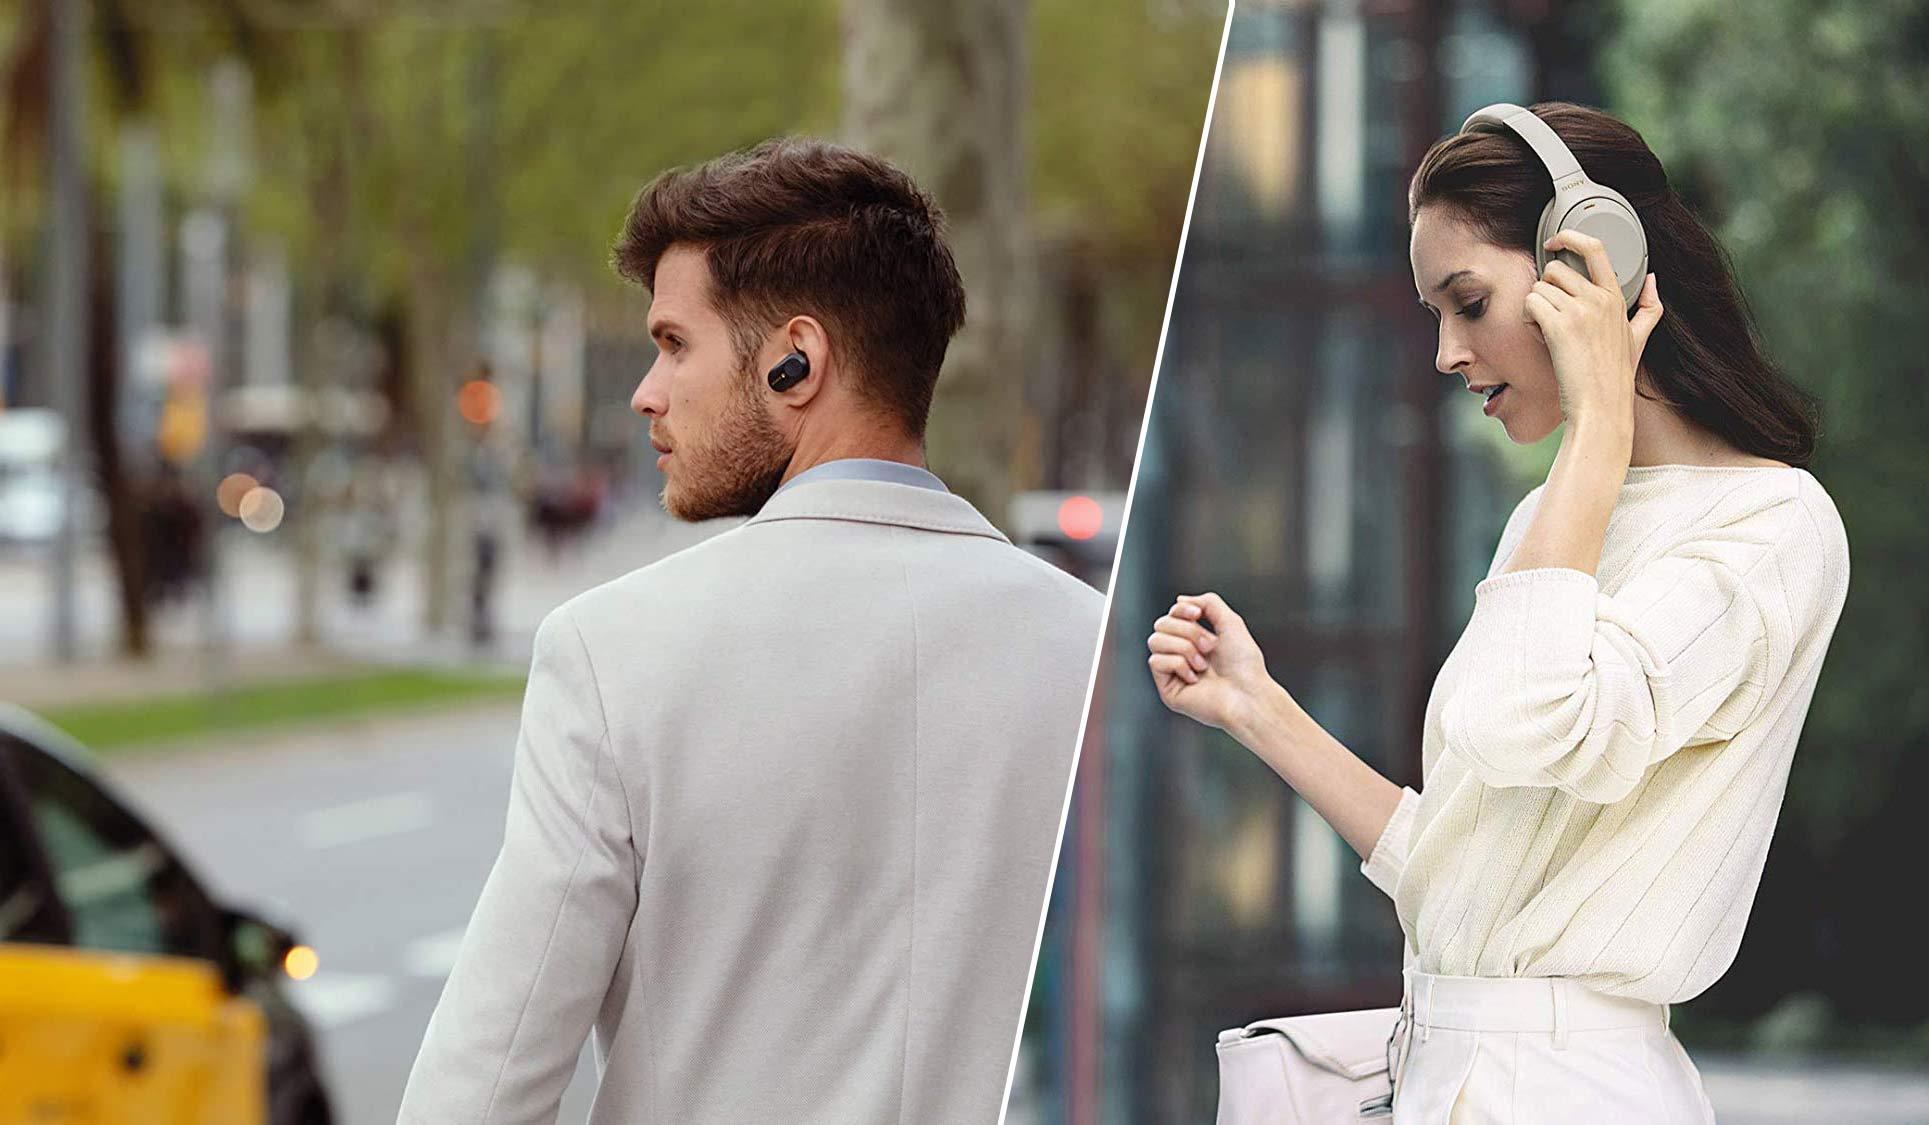 Up To 21% OFF! | Sony 1000XM3 Series Headphones